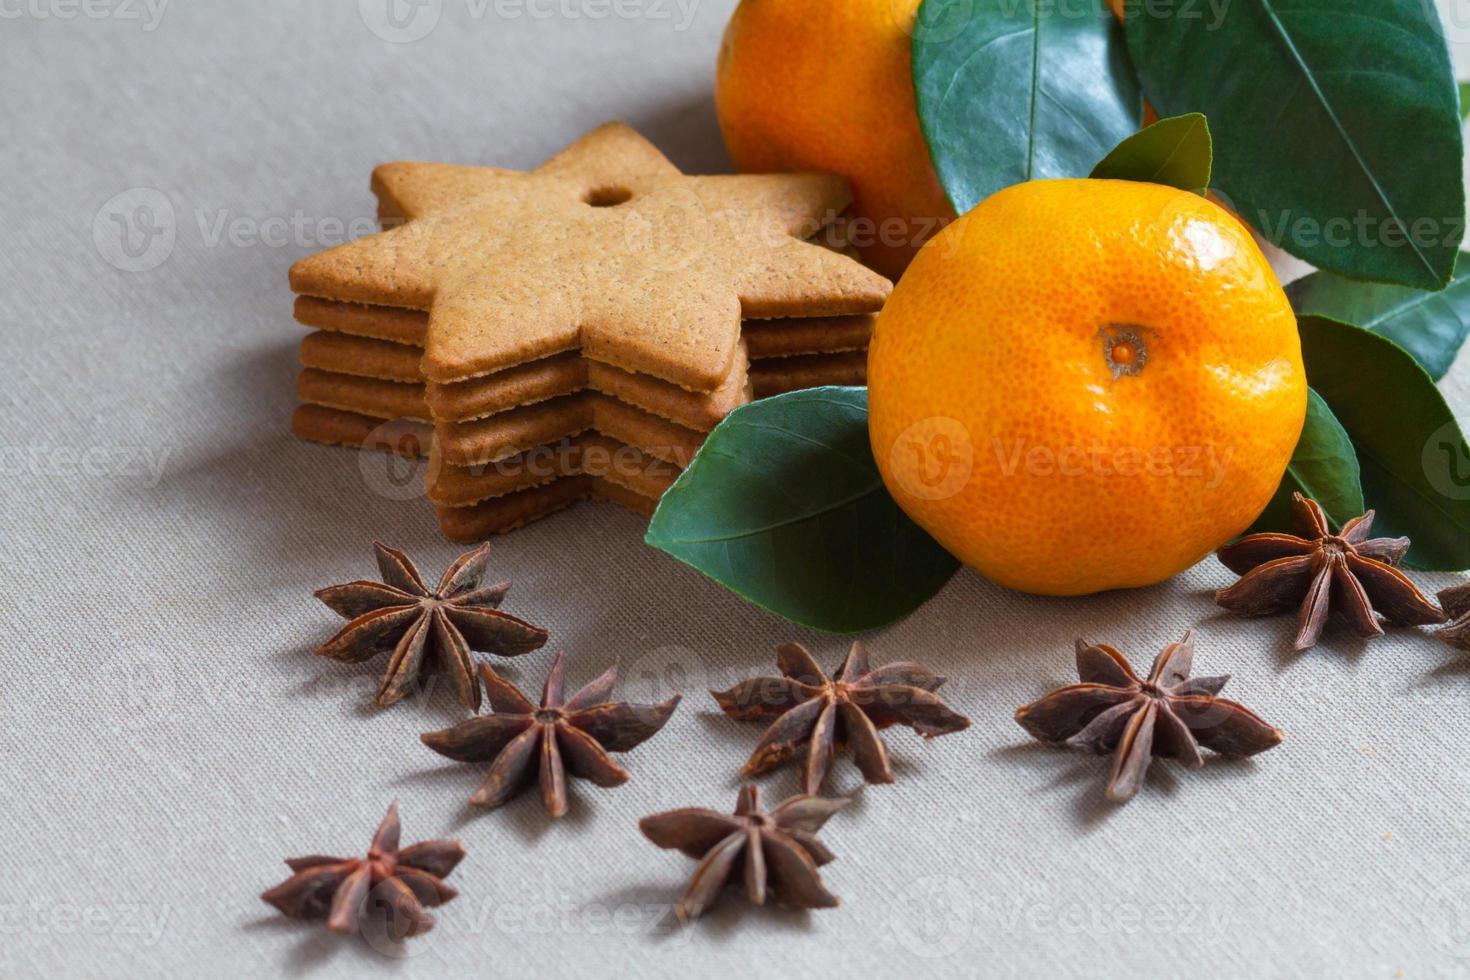 mandarino e biscotti foto